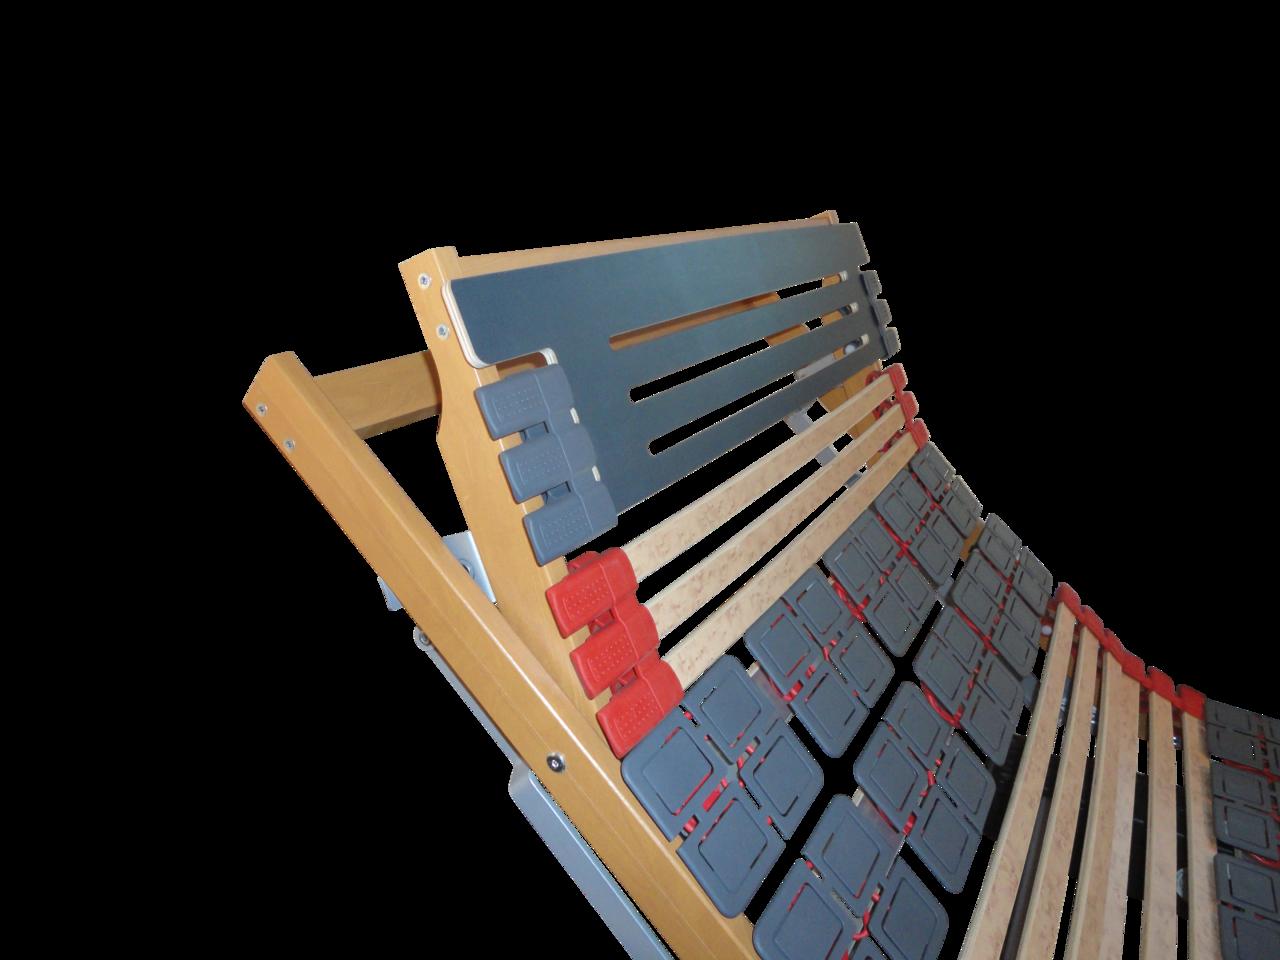 7 zonen teller lattenrost rhodos el komfort elektrisch verstellbar 90x200 cm fmp matratzen. Black Bedroom Furniture Sets. Home Design Ideas